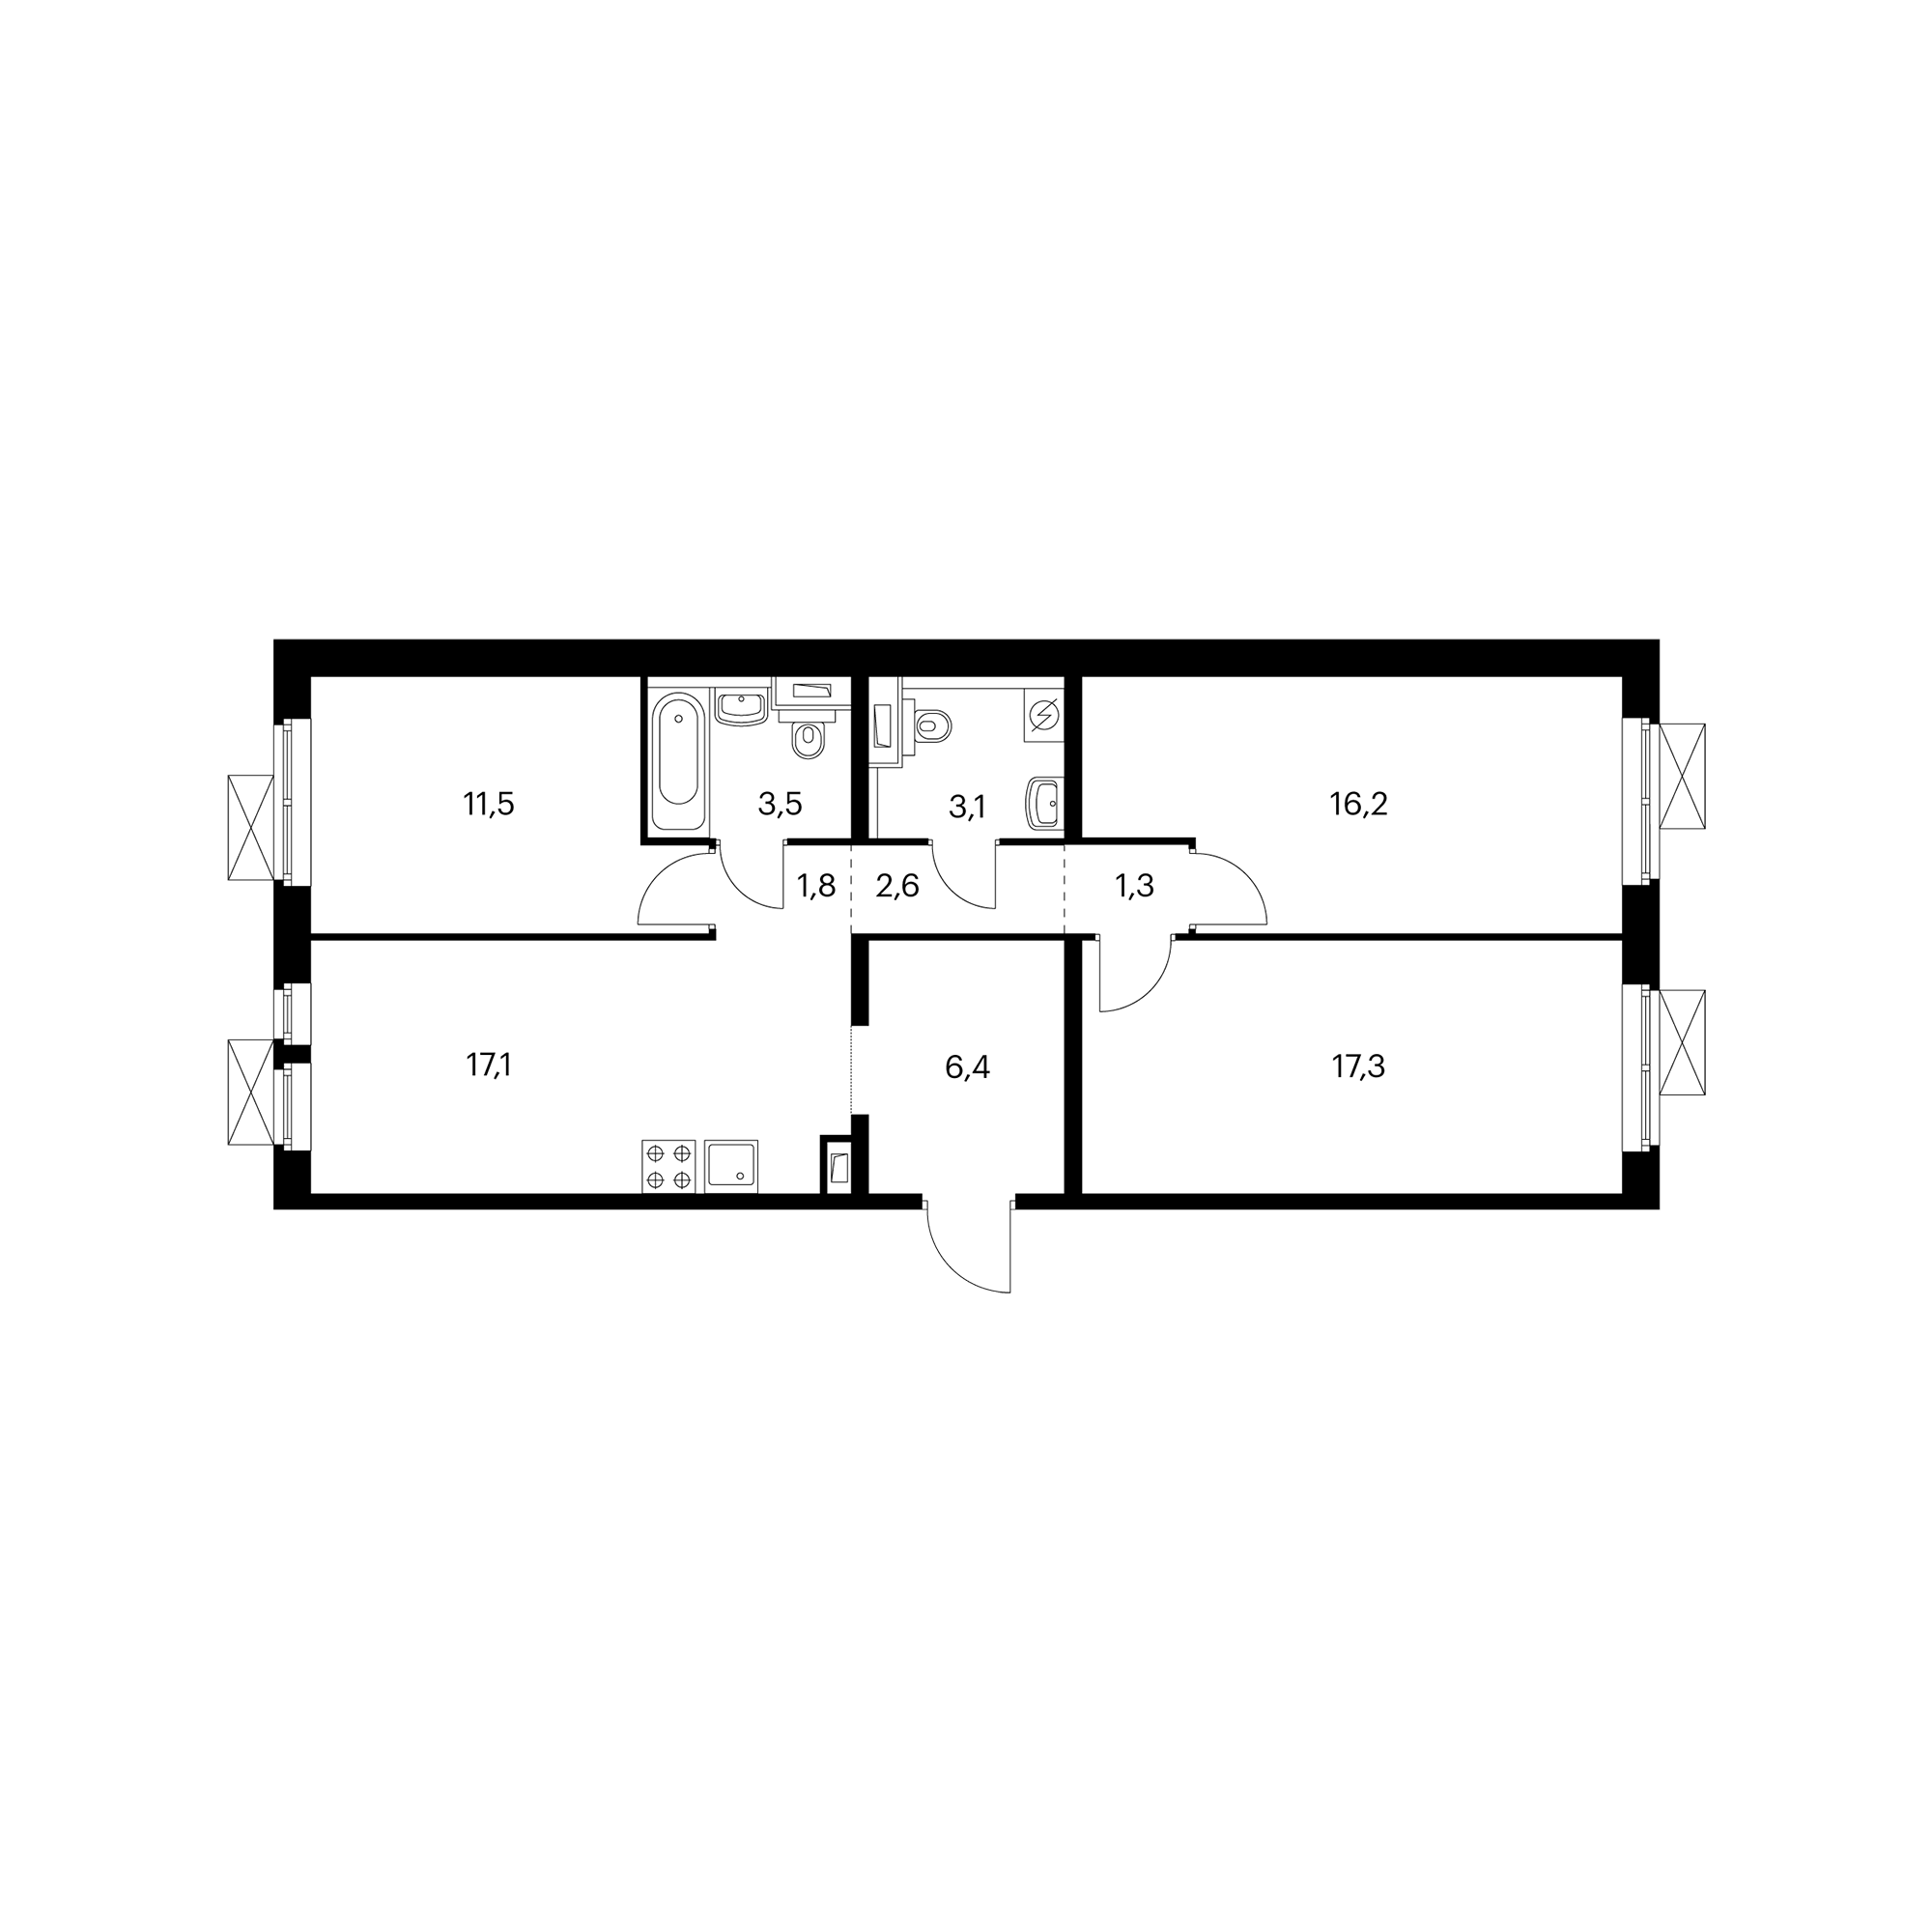 3KM16_6.0-1_S_Z1